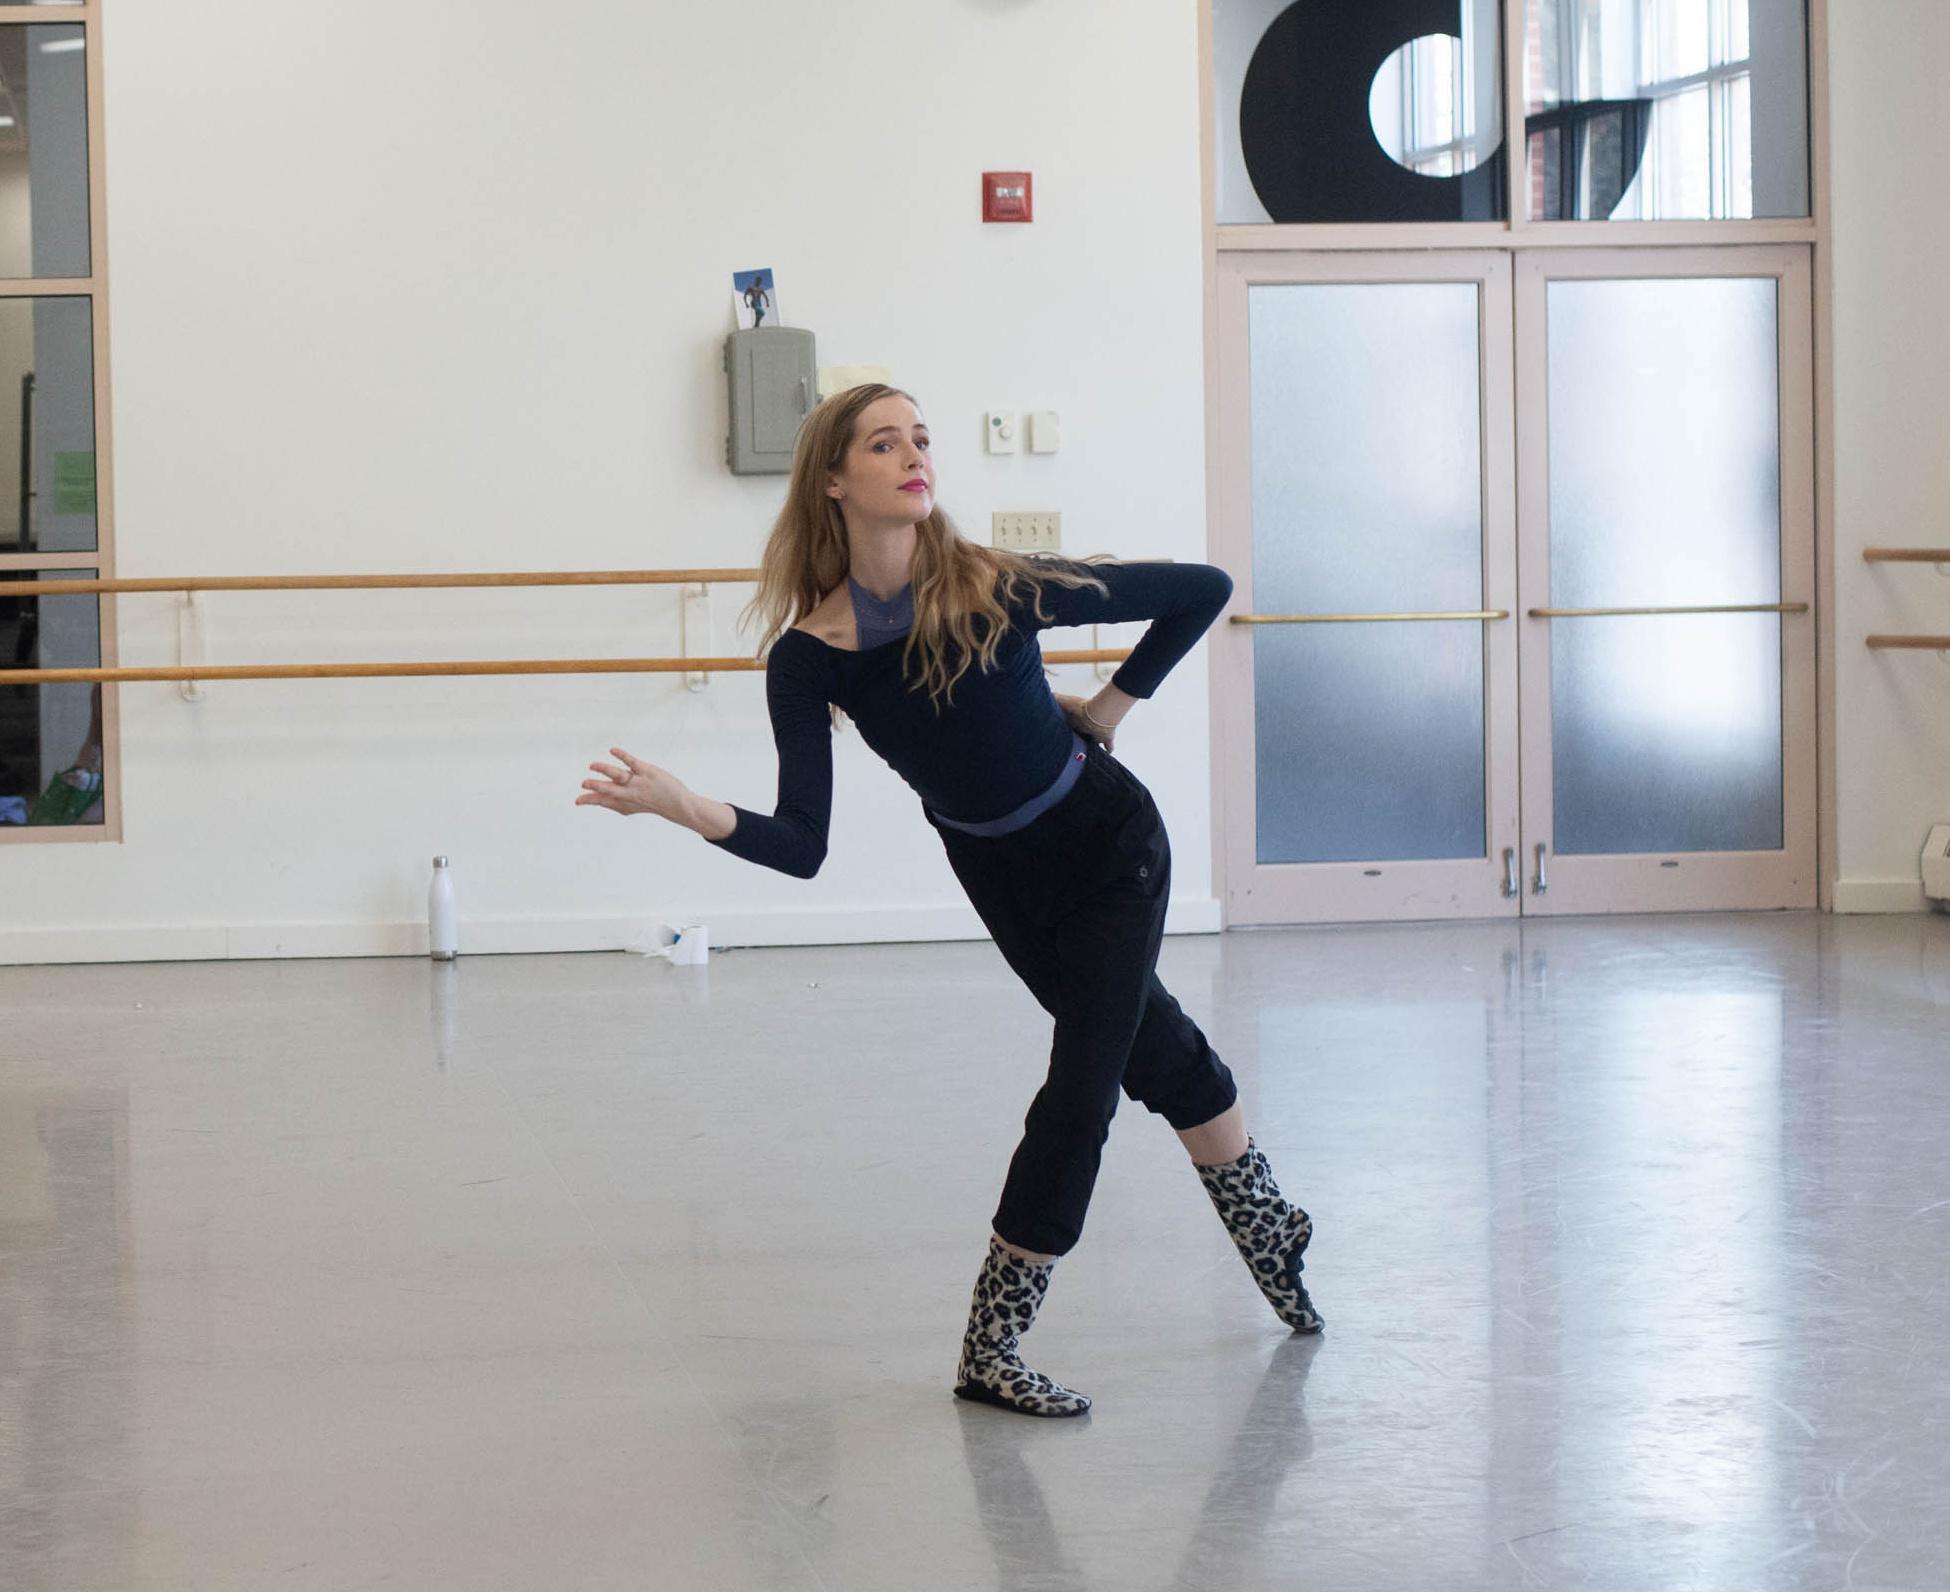 What Happens When a Ballerina Choreographs for a Music Festival